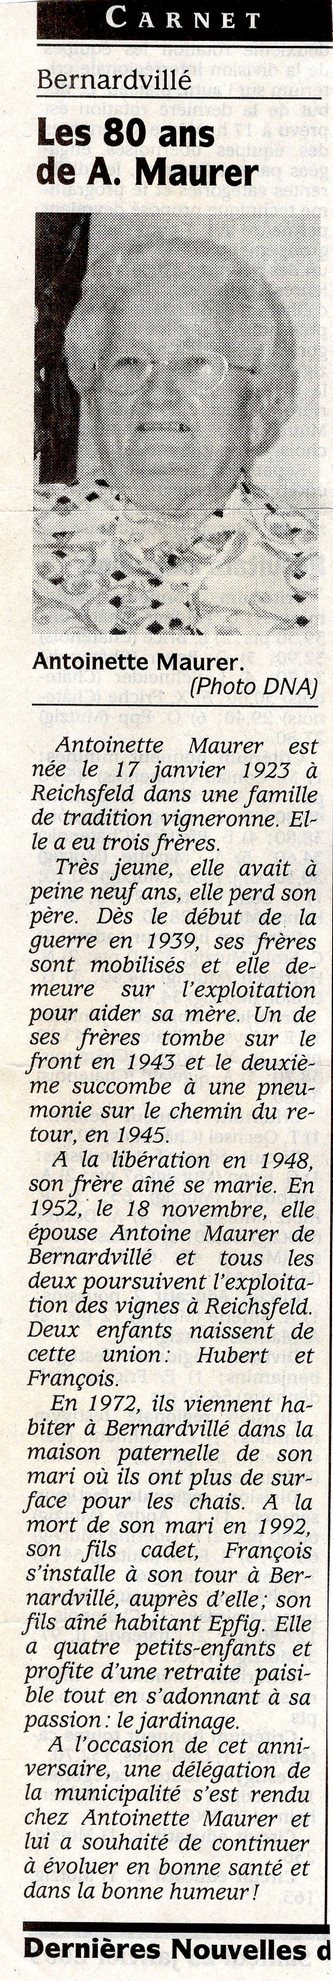 80 ans d'Antoinette Maurer194 (Copier).j